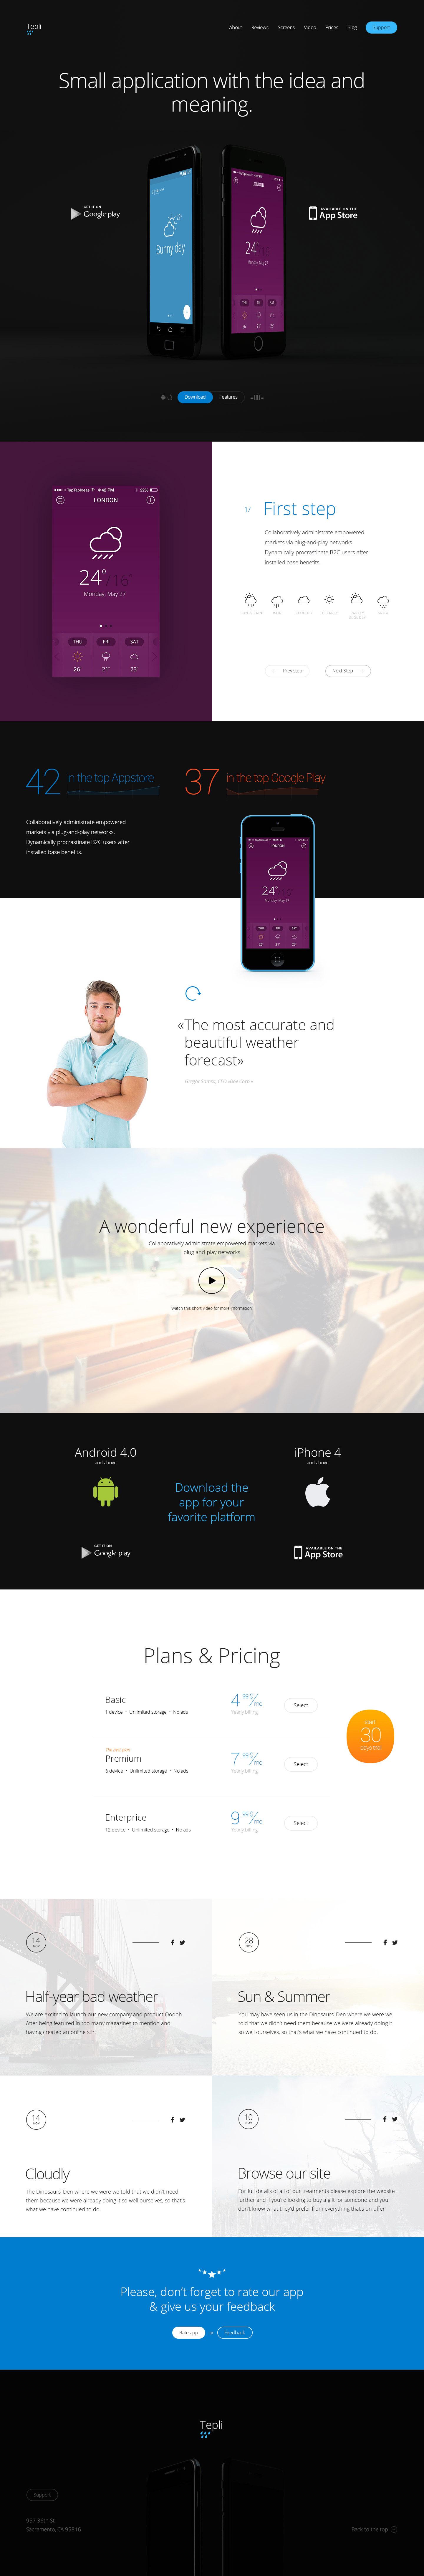 tepli_homepage